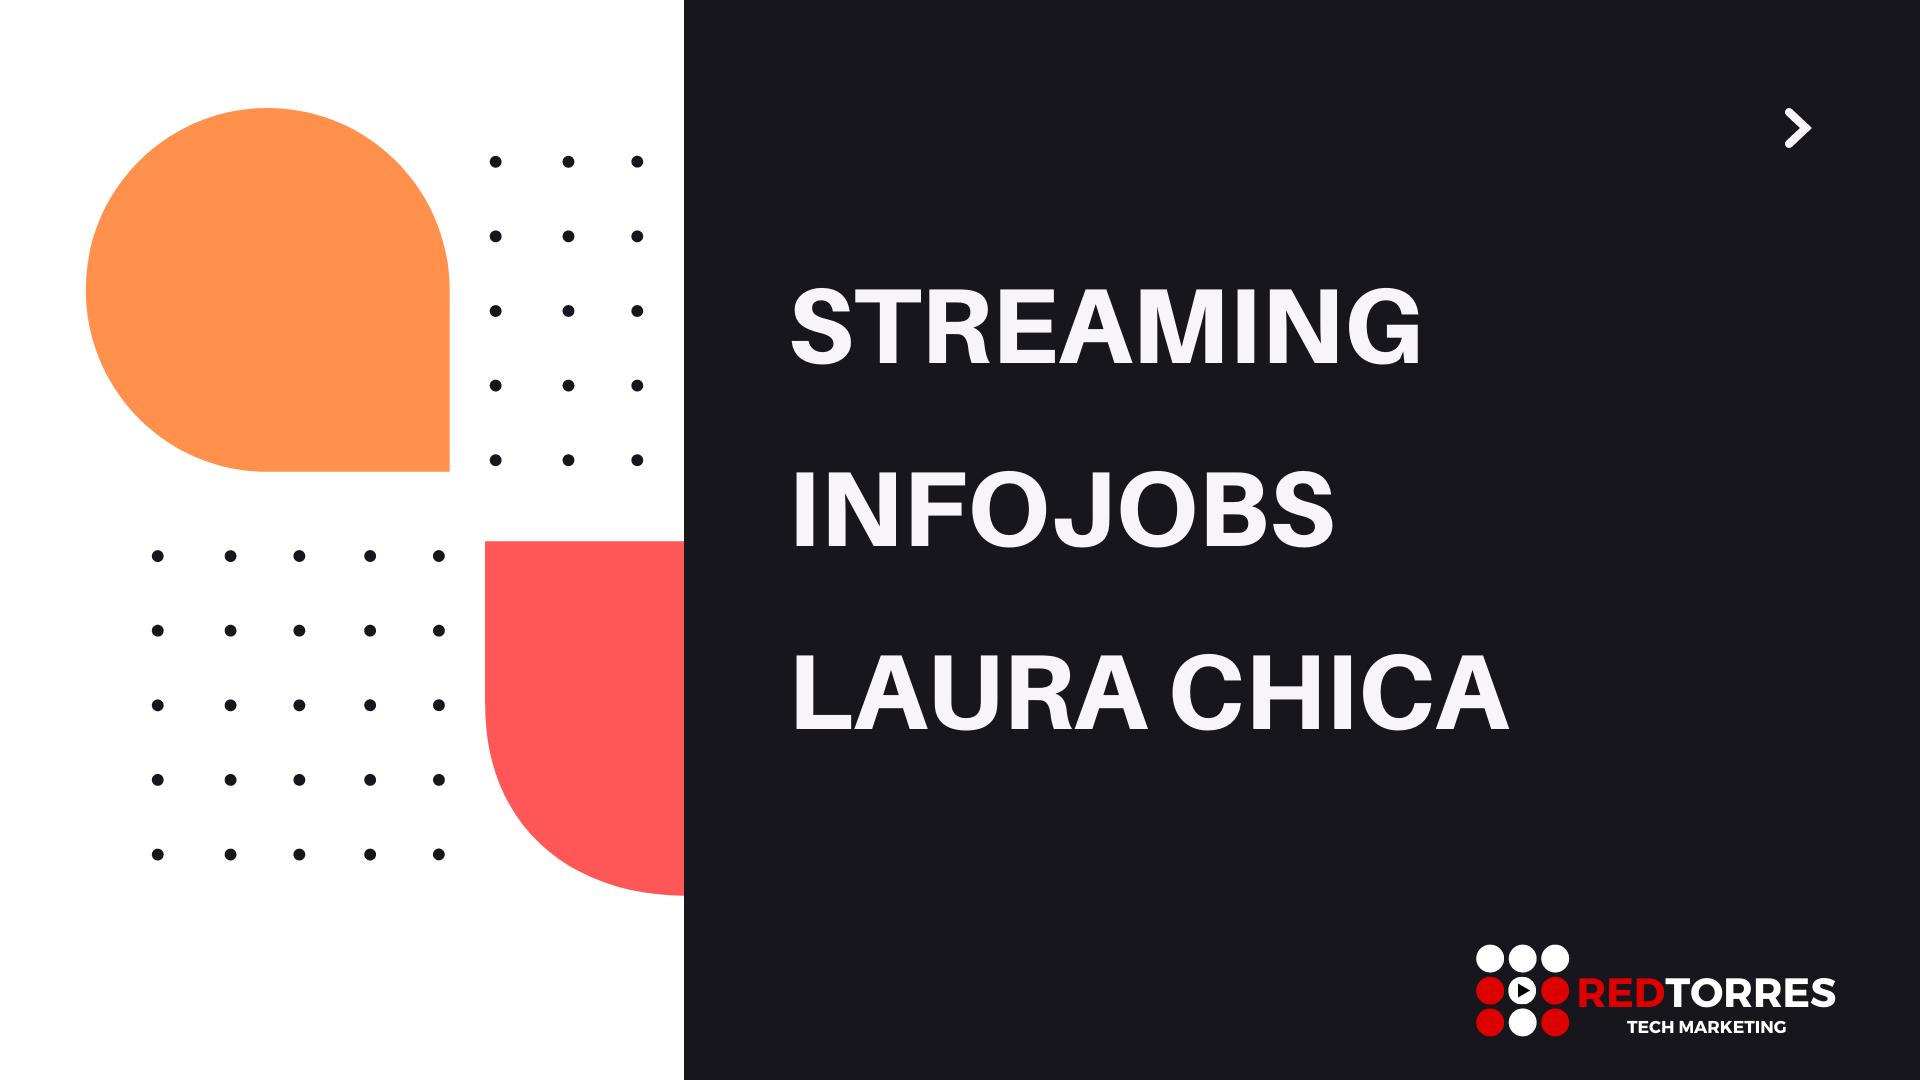 Streaming Infojobs Freelance | REDTORRES